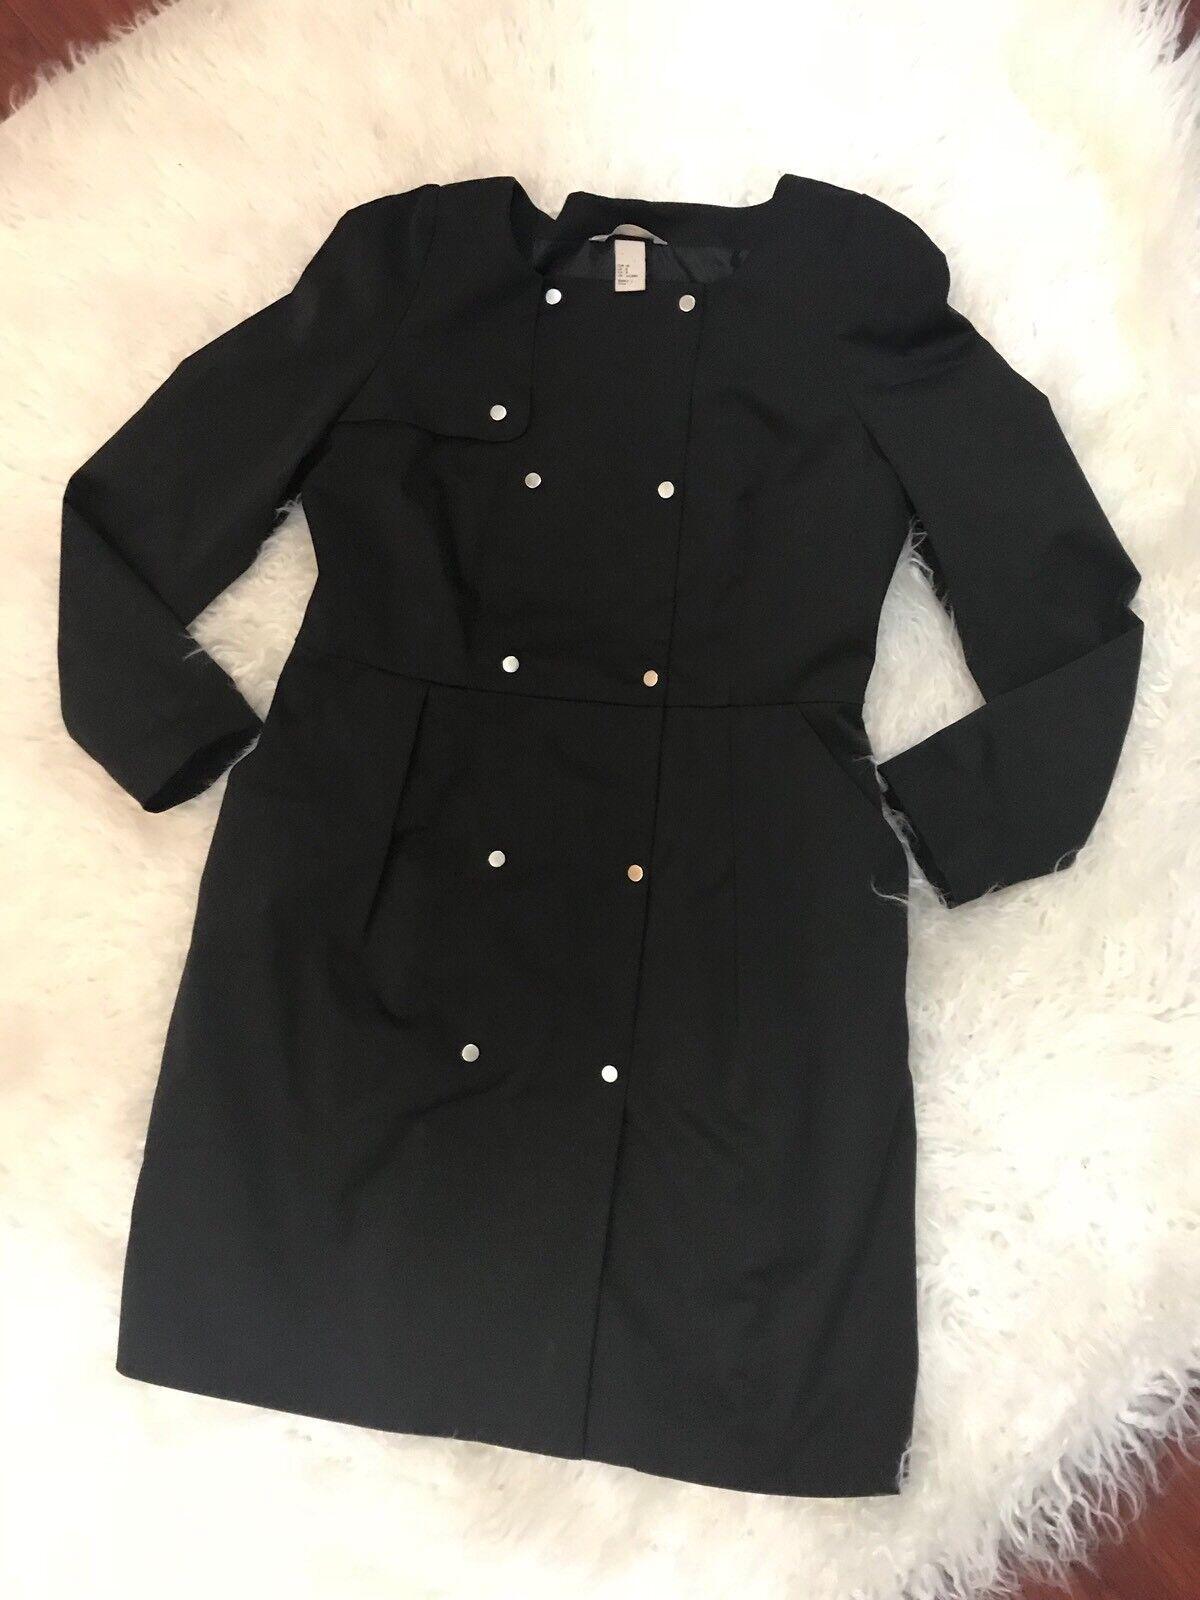 H&M Women's Pea Coat Style Dress Size 8